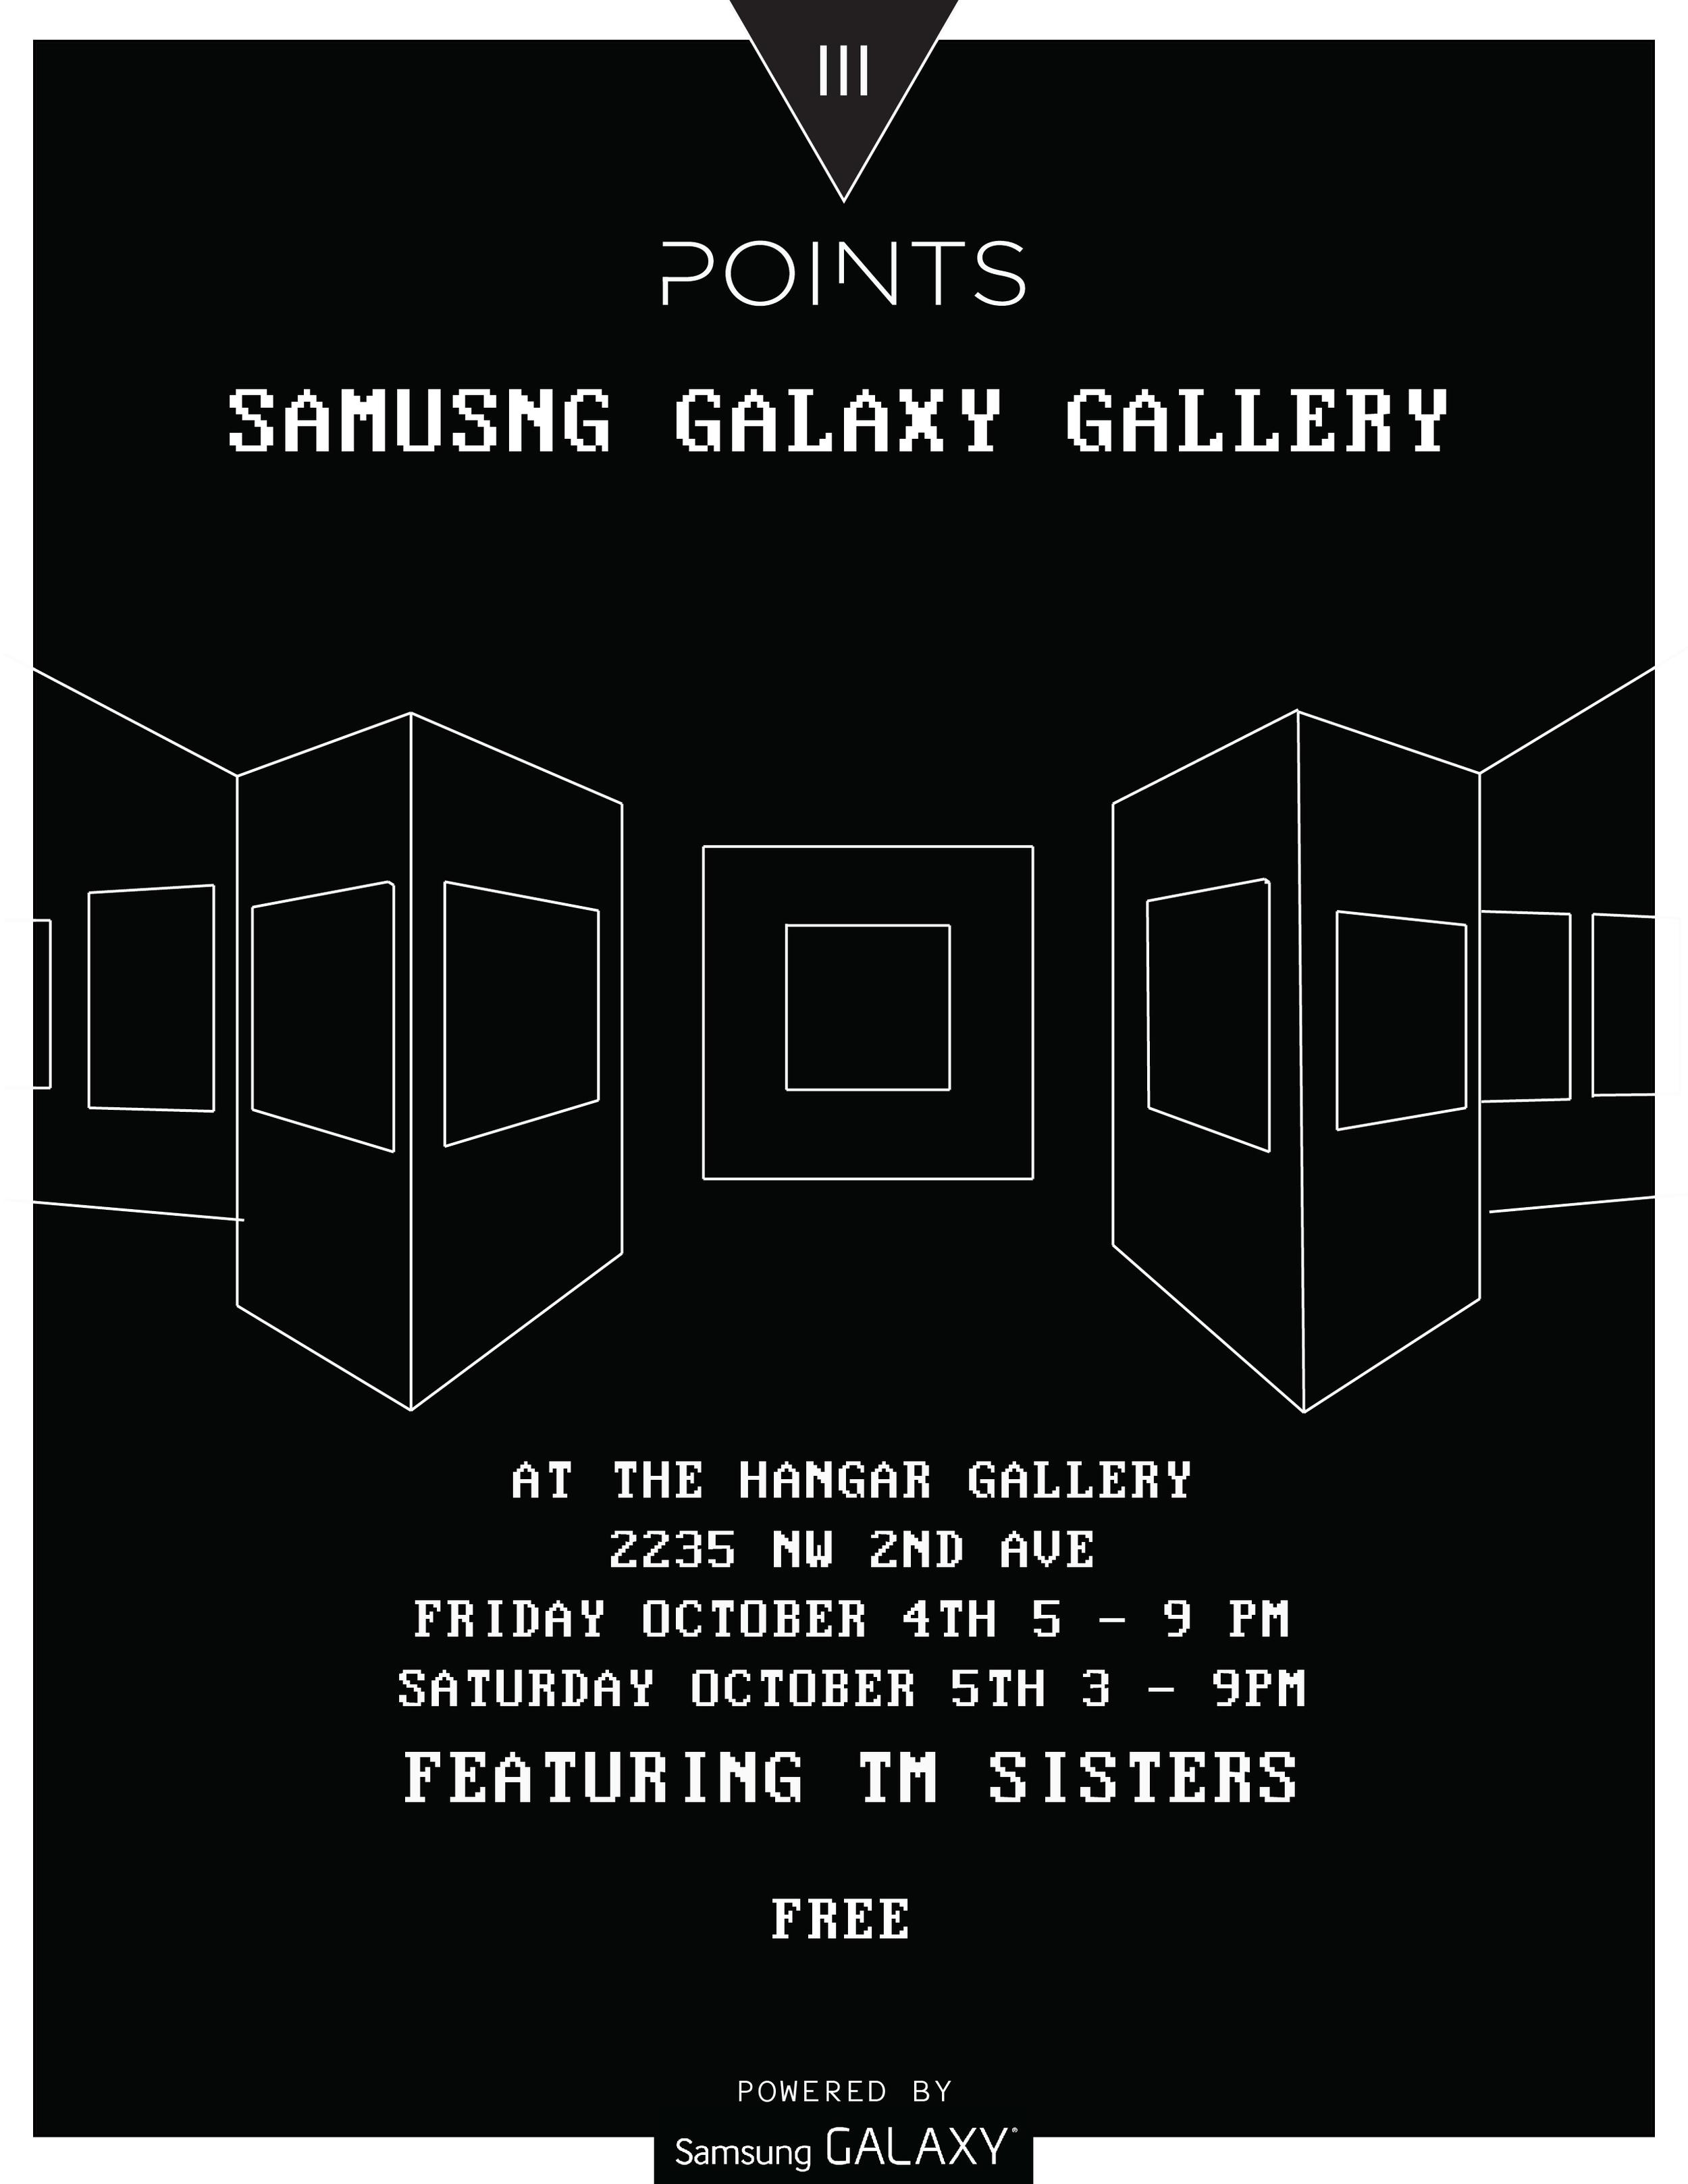 samasunggallery-01-01.jpg